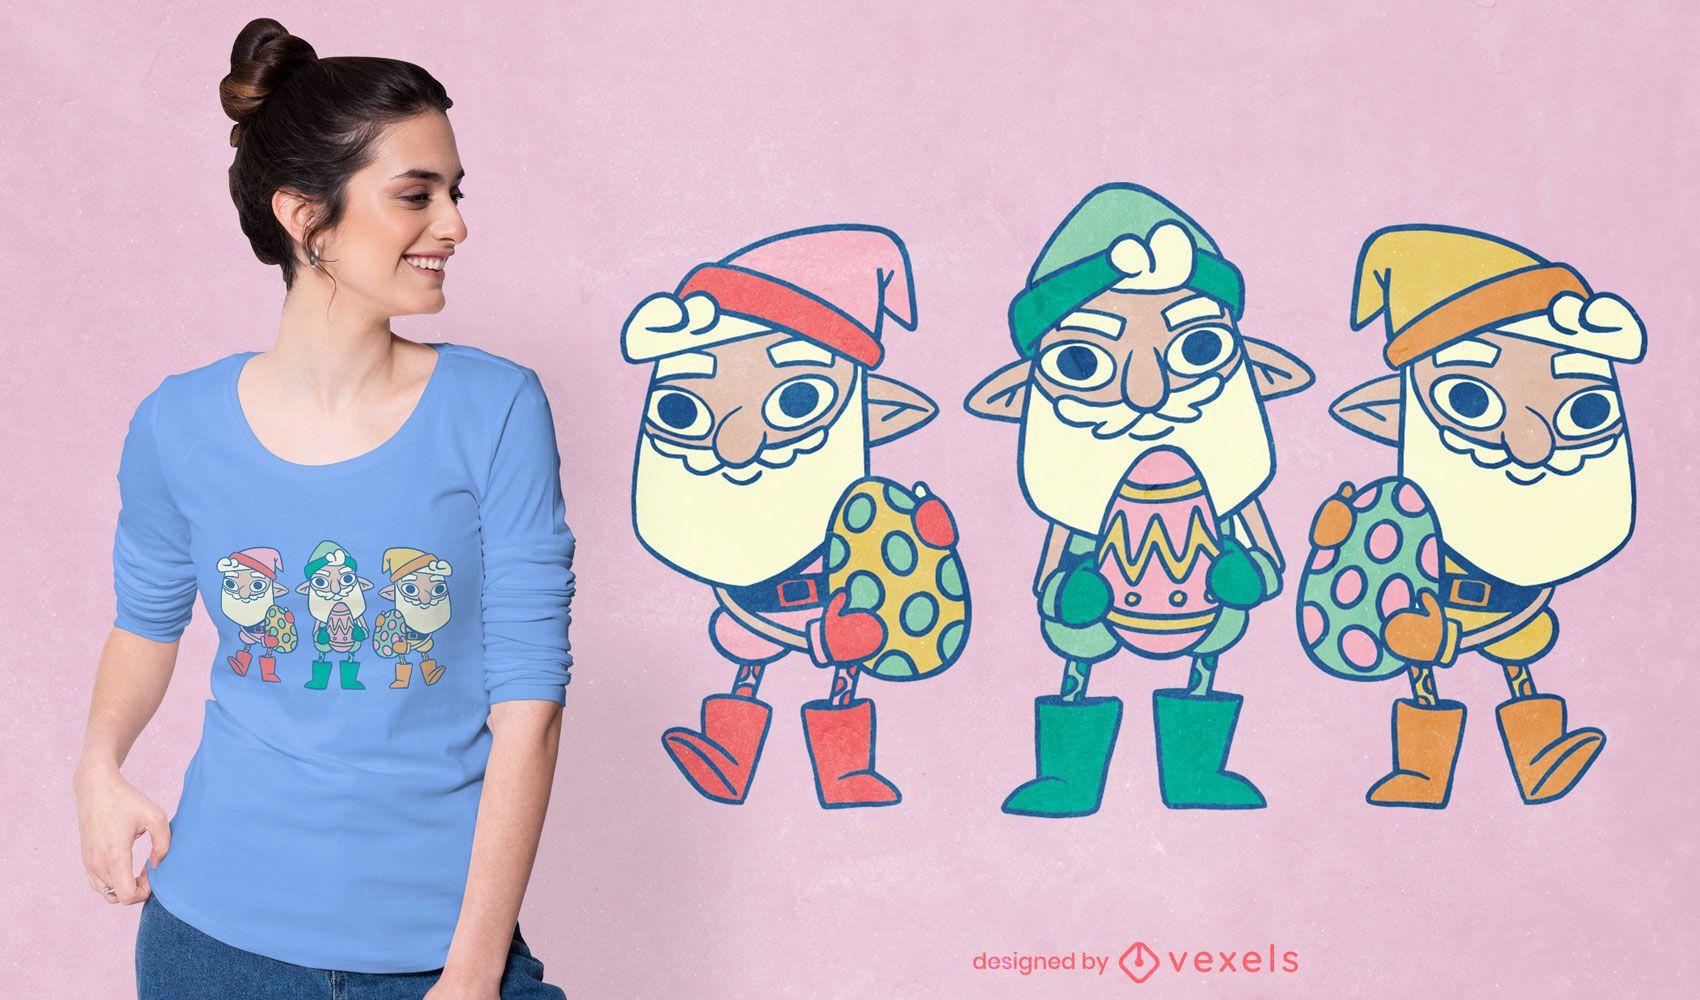 Diseño de camiseta de dibujos animados de gnomos de pascua